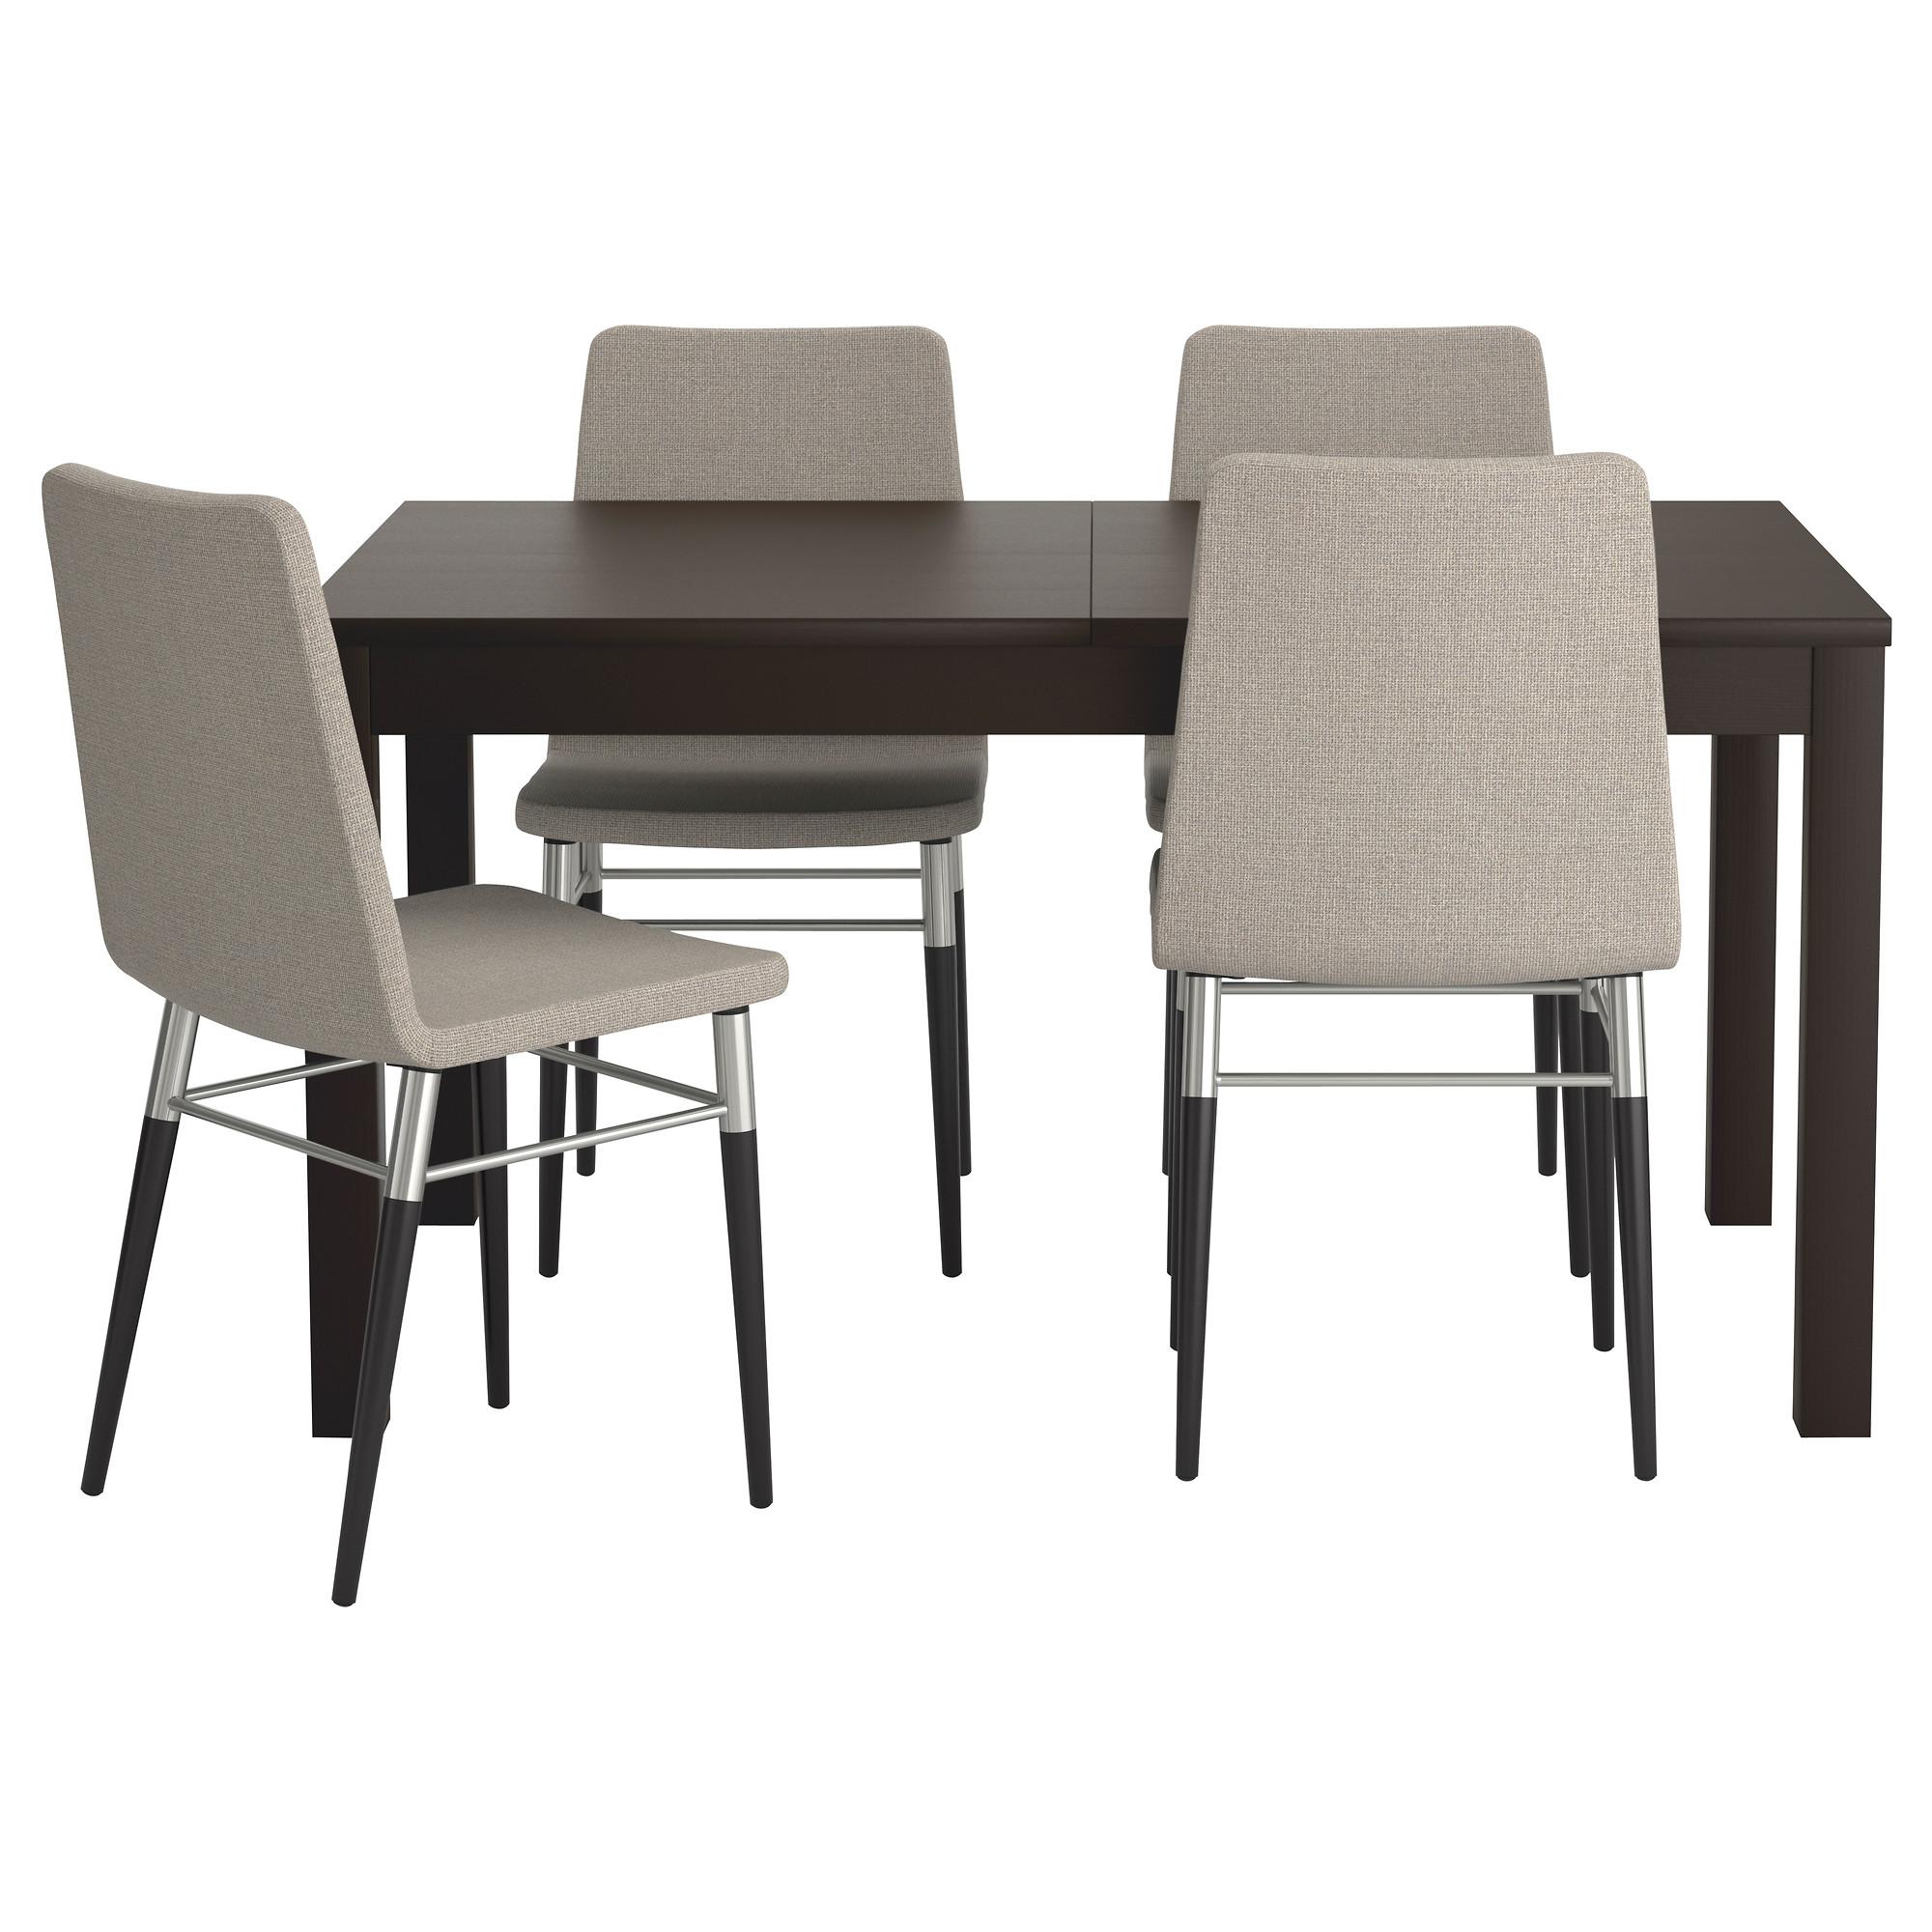 dining table and chairs bjursta / preben table and 4 chairs, brown-black, tenö light gray length XQNIXBU